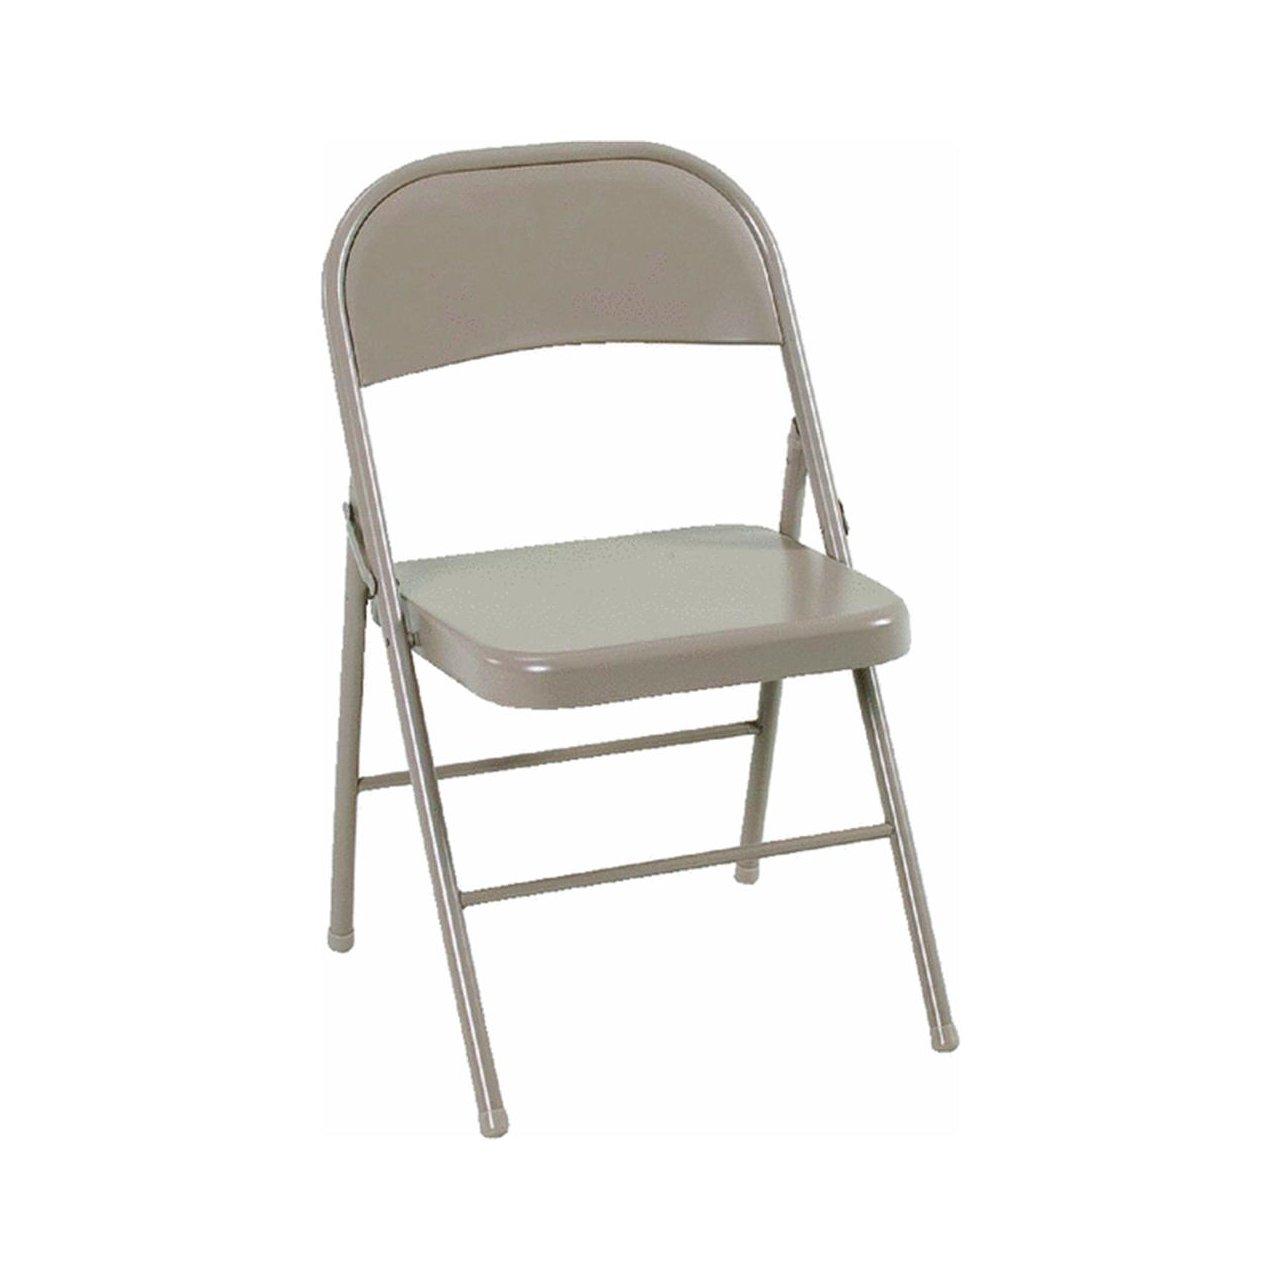 a chair w green eurohike bl peak equipment folding h